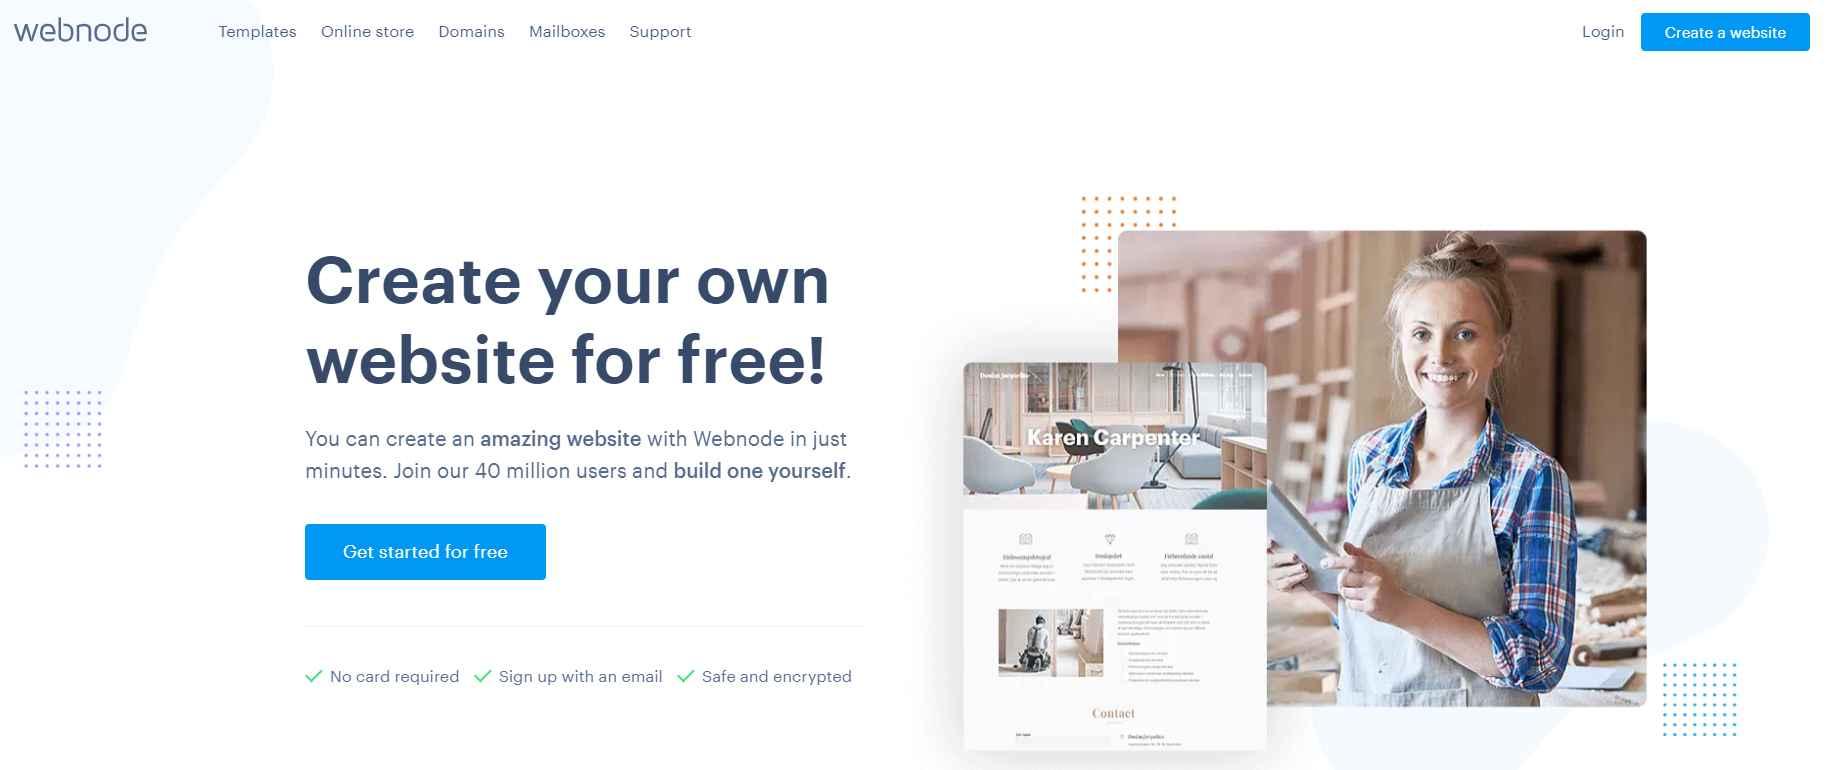 webnode Should I Go for a Cheap Website Design in Singapore